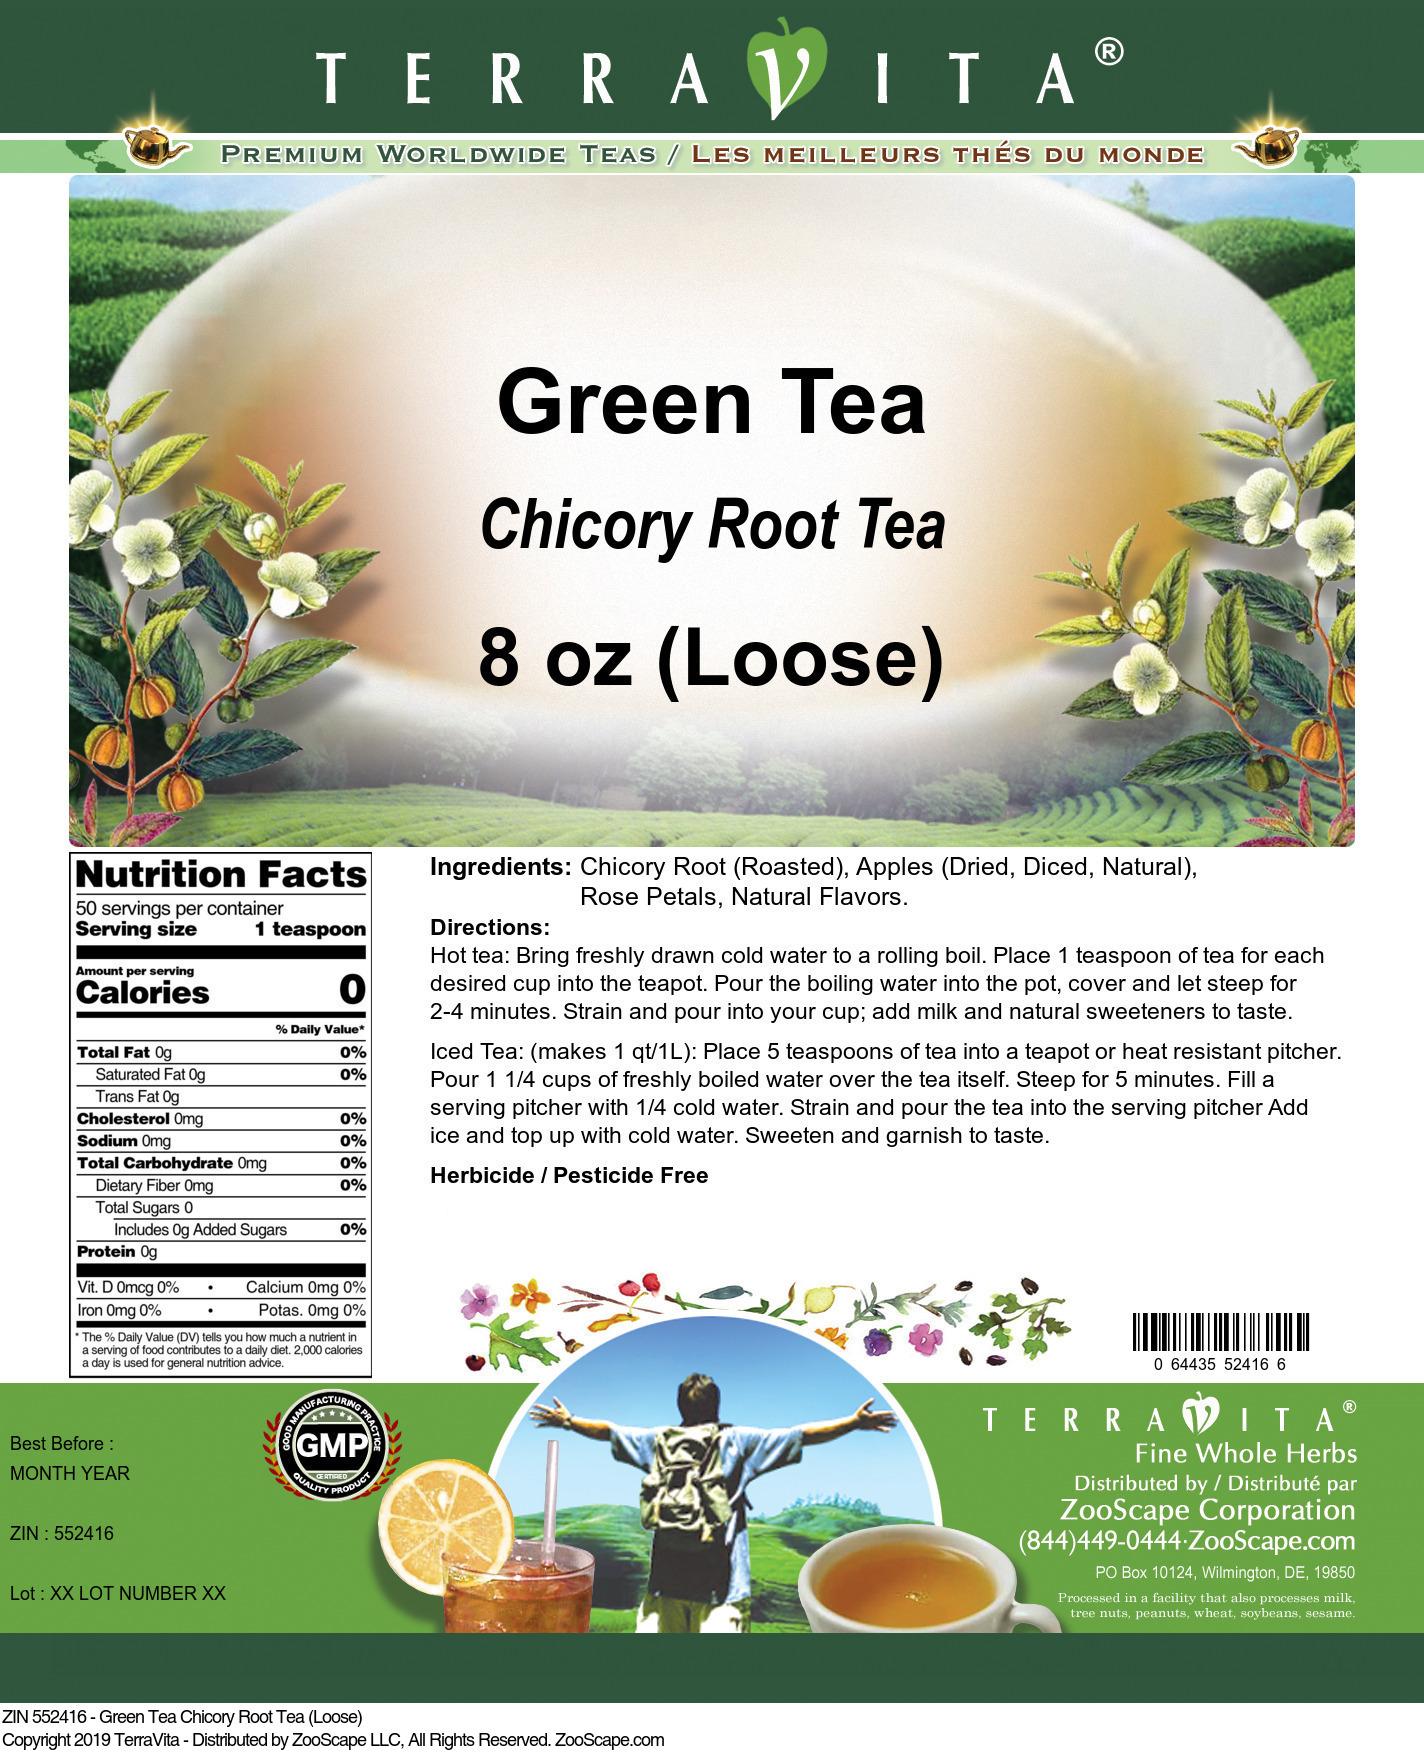 Green Tea Chicory Root Tea (Loose)